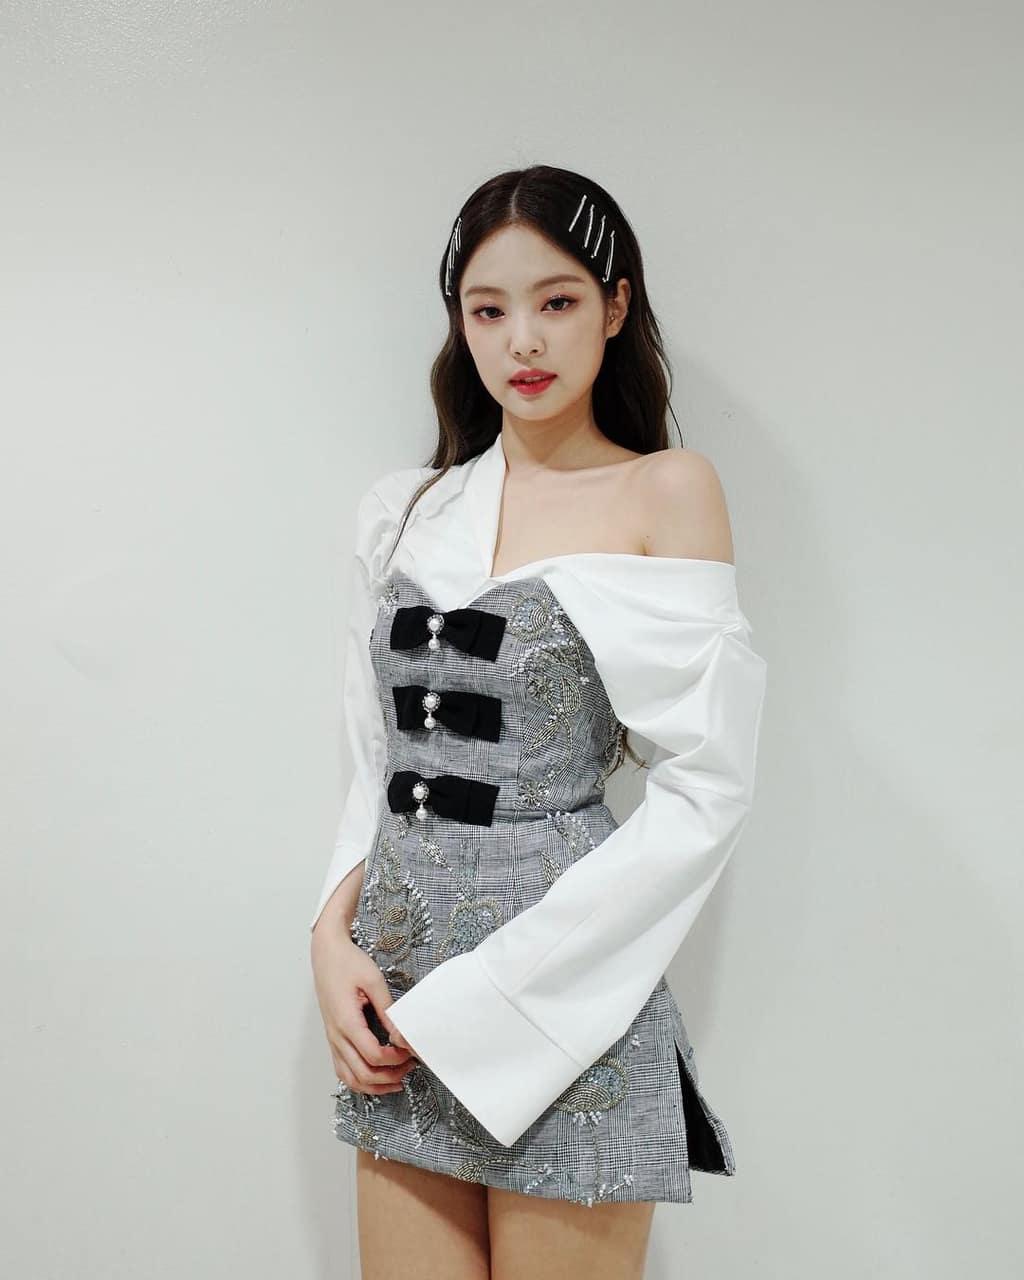 jennie kim mặc áo sơ mi rộng thành áo trễ vai